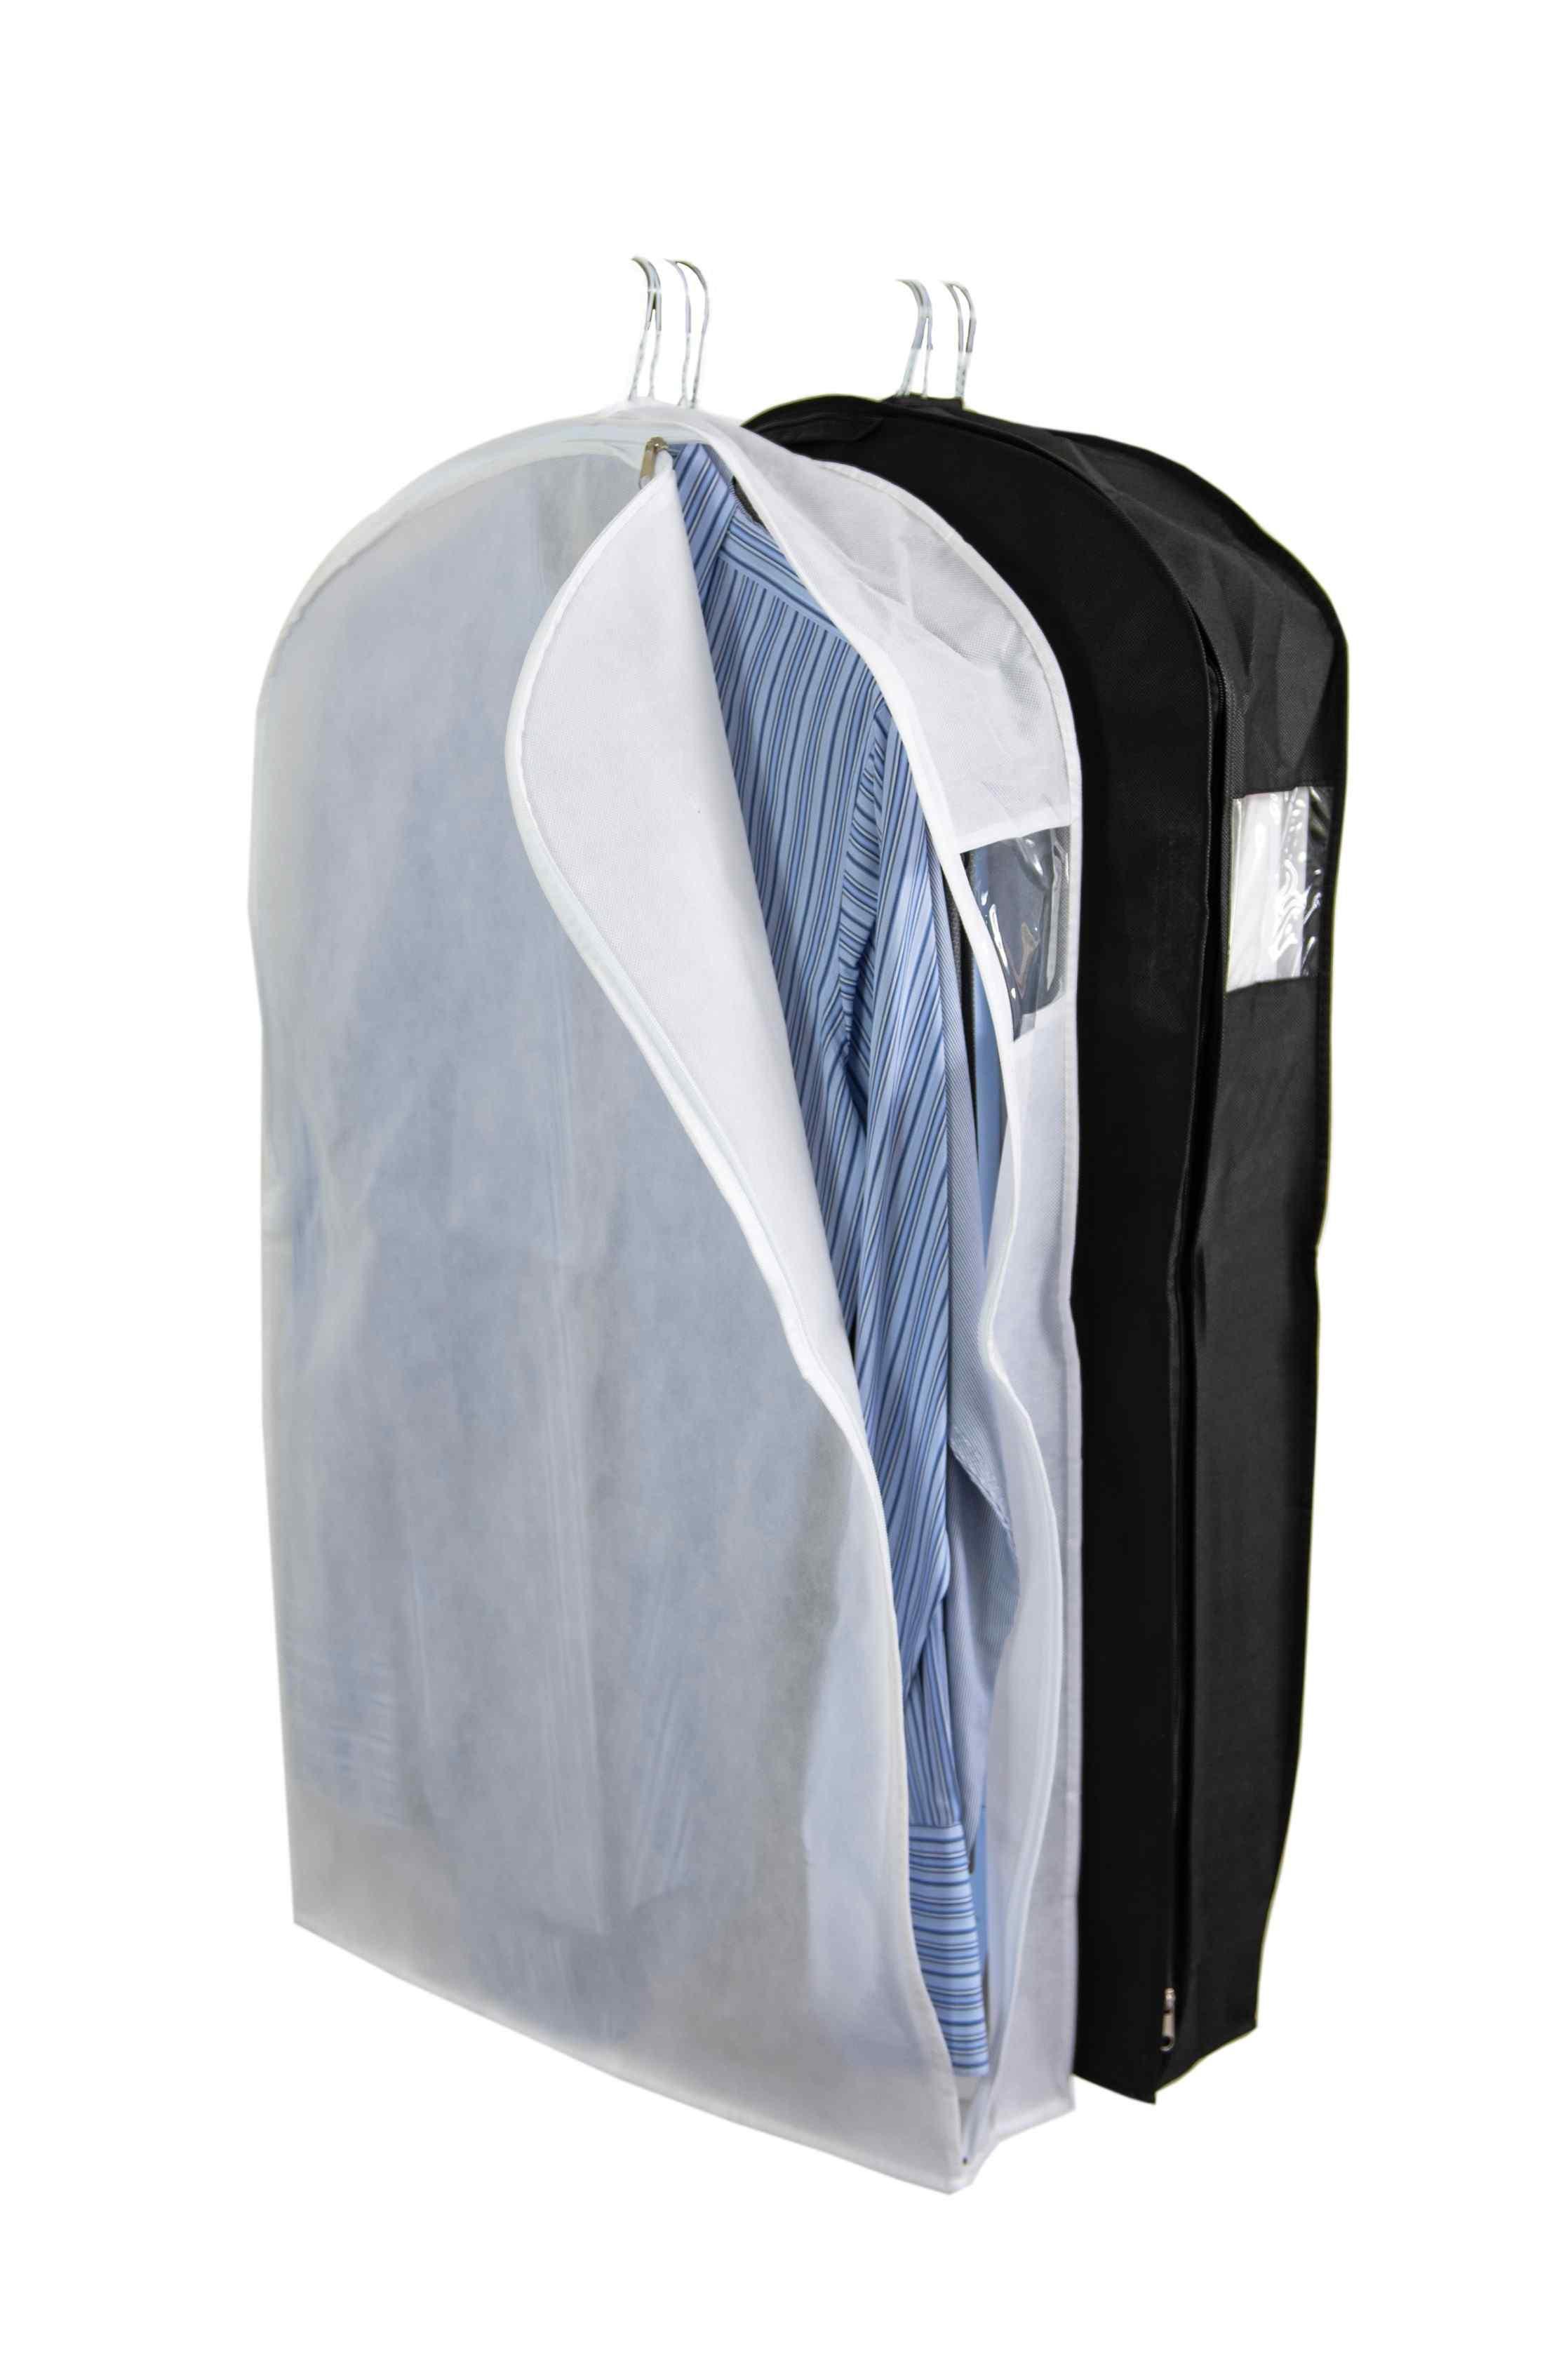 Black Non Woven Shirt Bag Gusseted